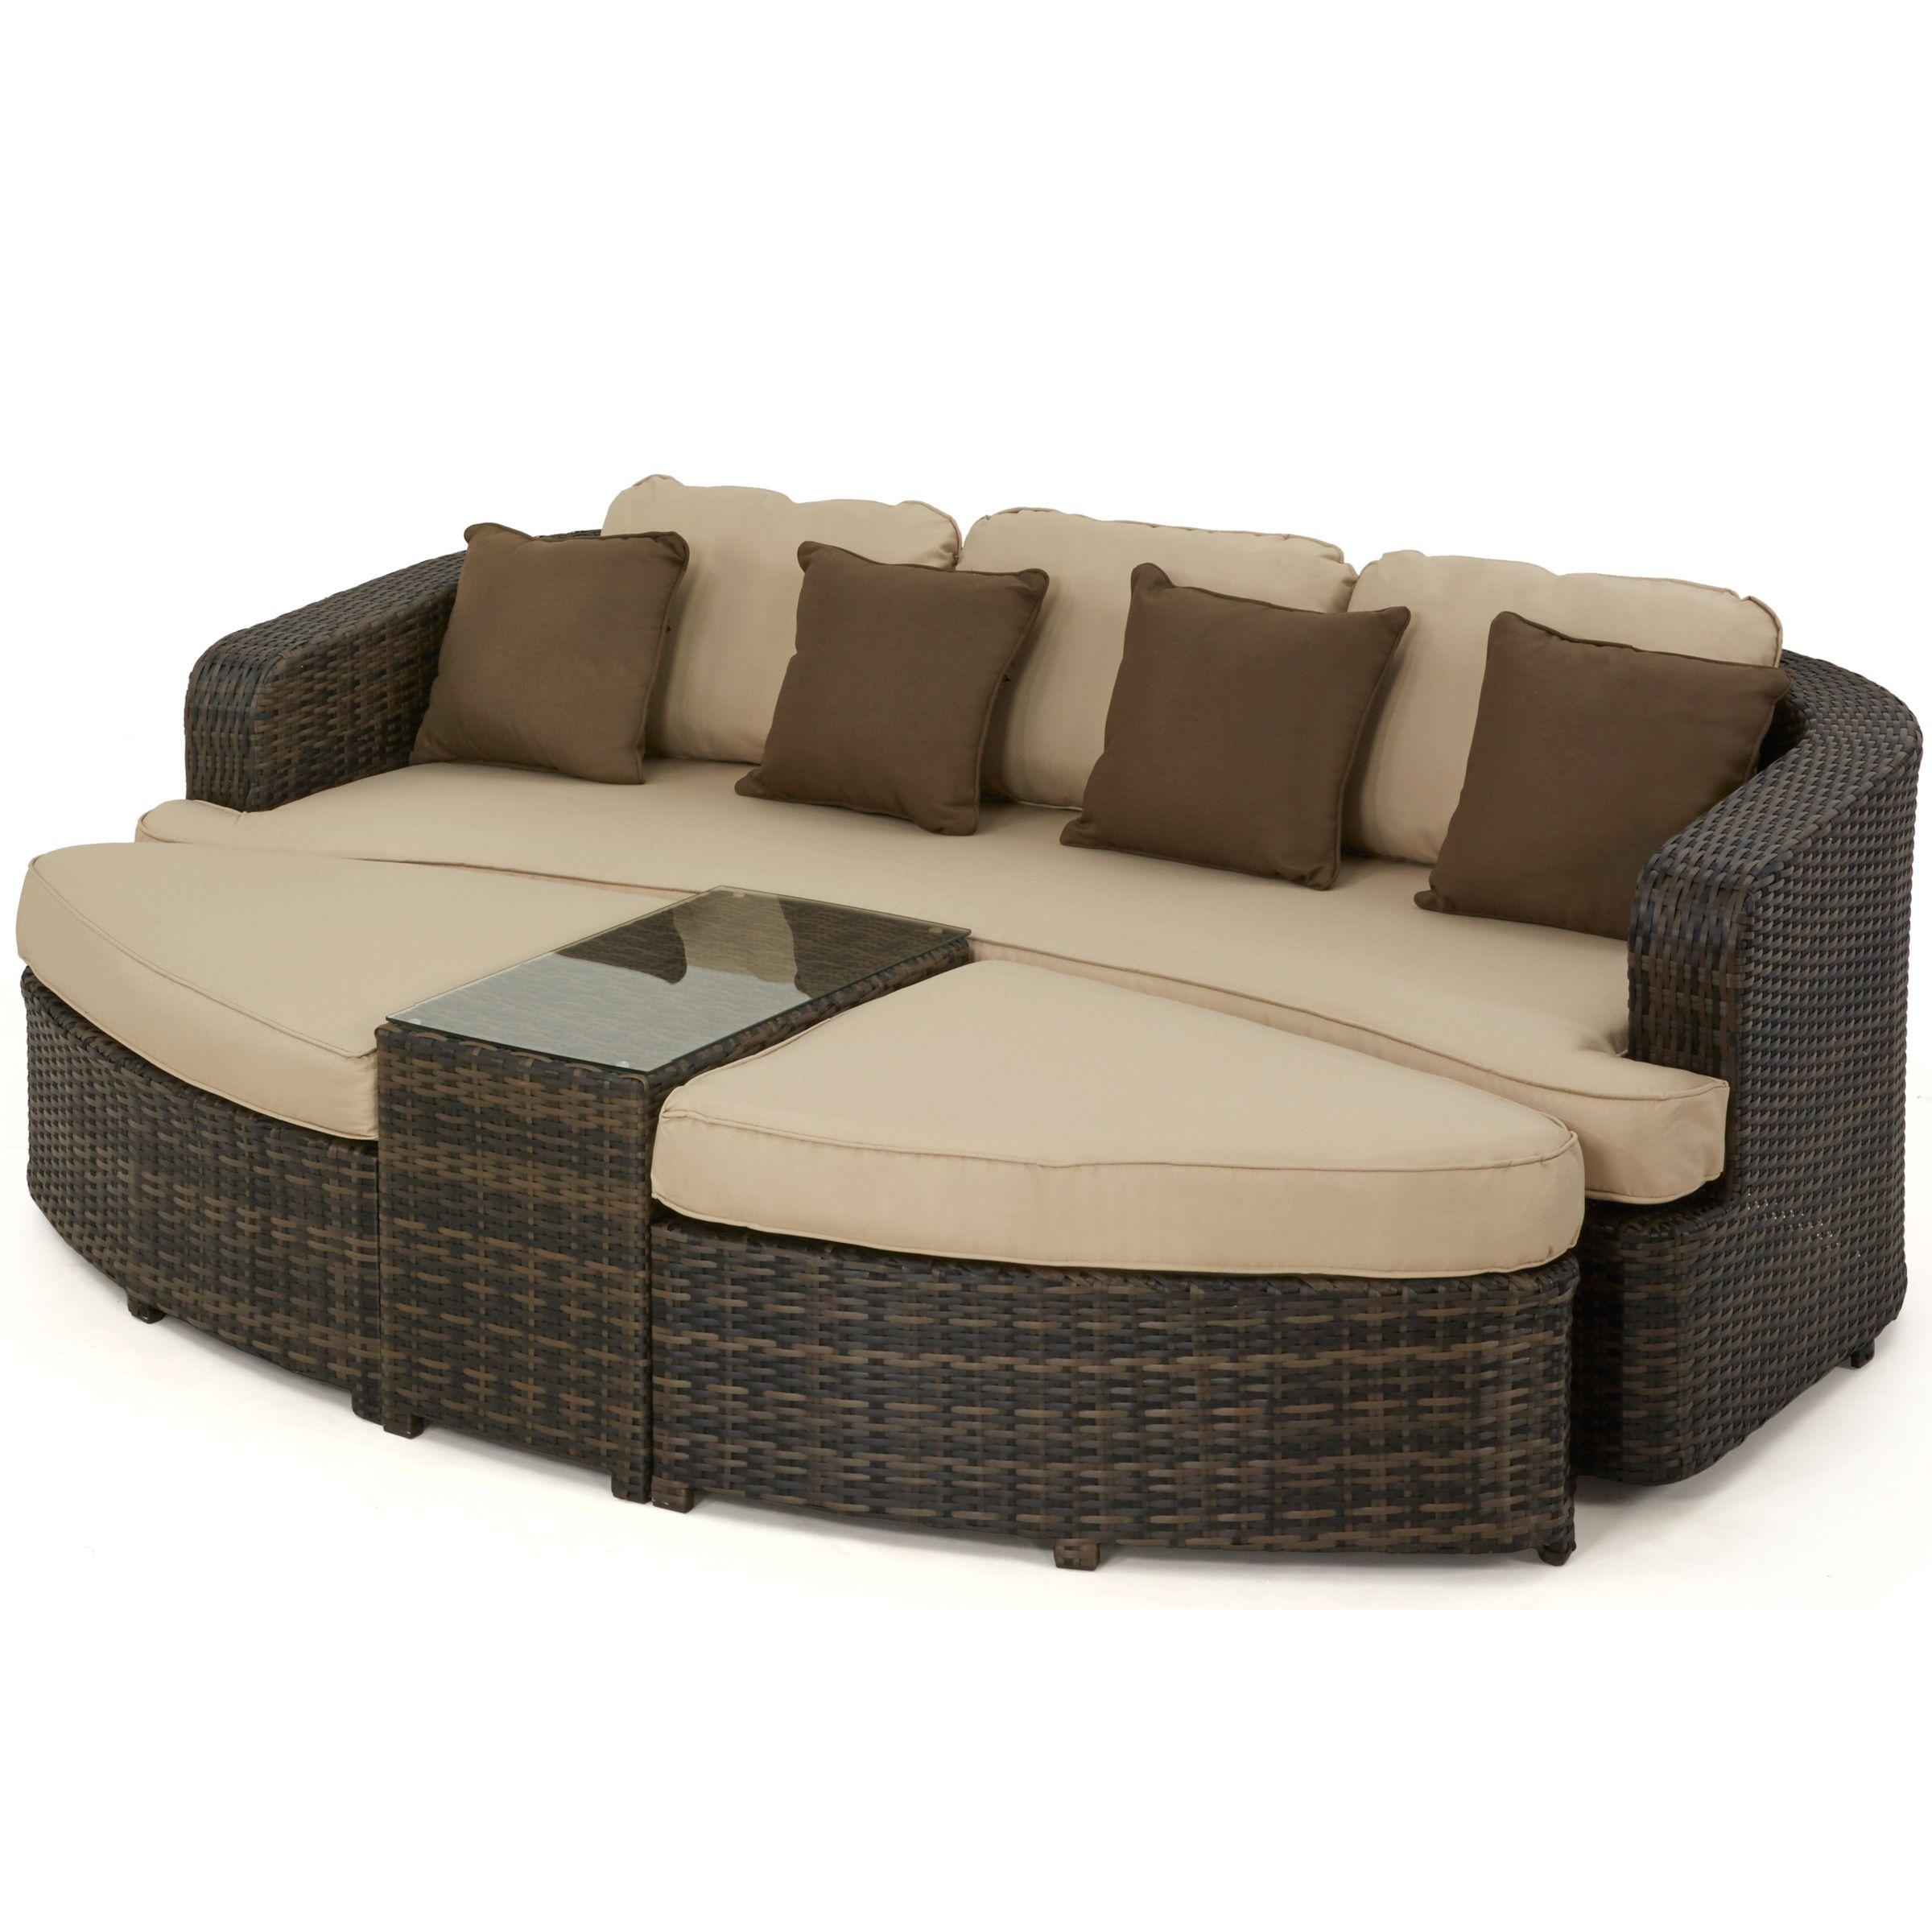 Berg 9 Seater Rattan Sofa Set | Patio furniture for sale ...